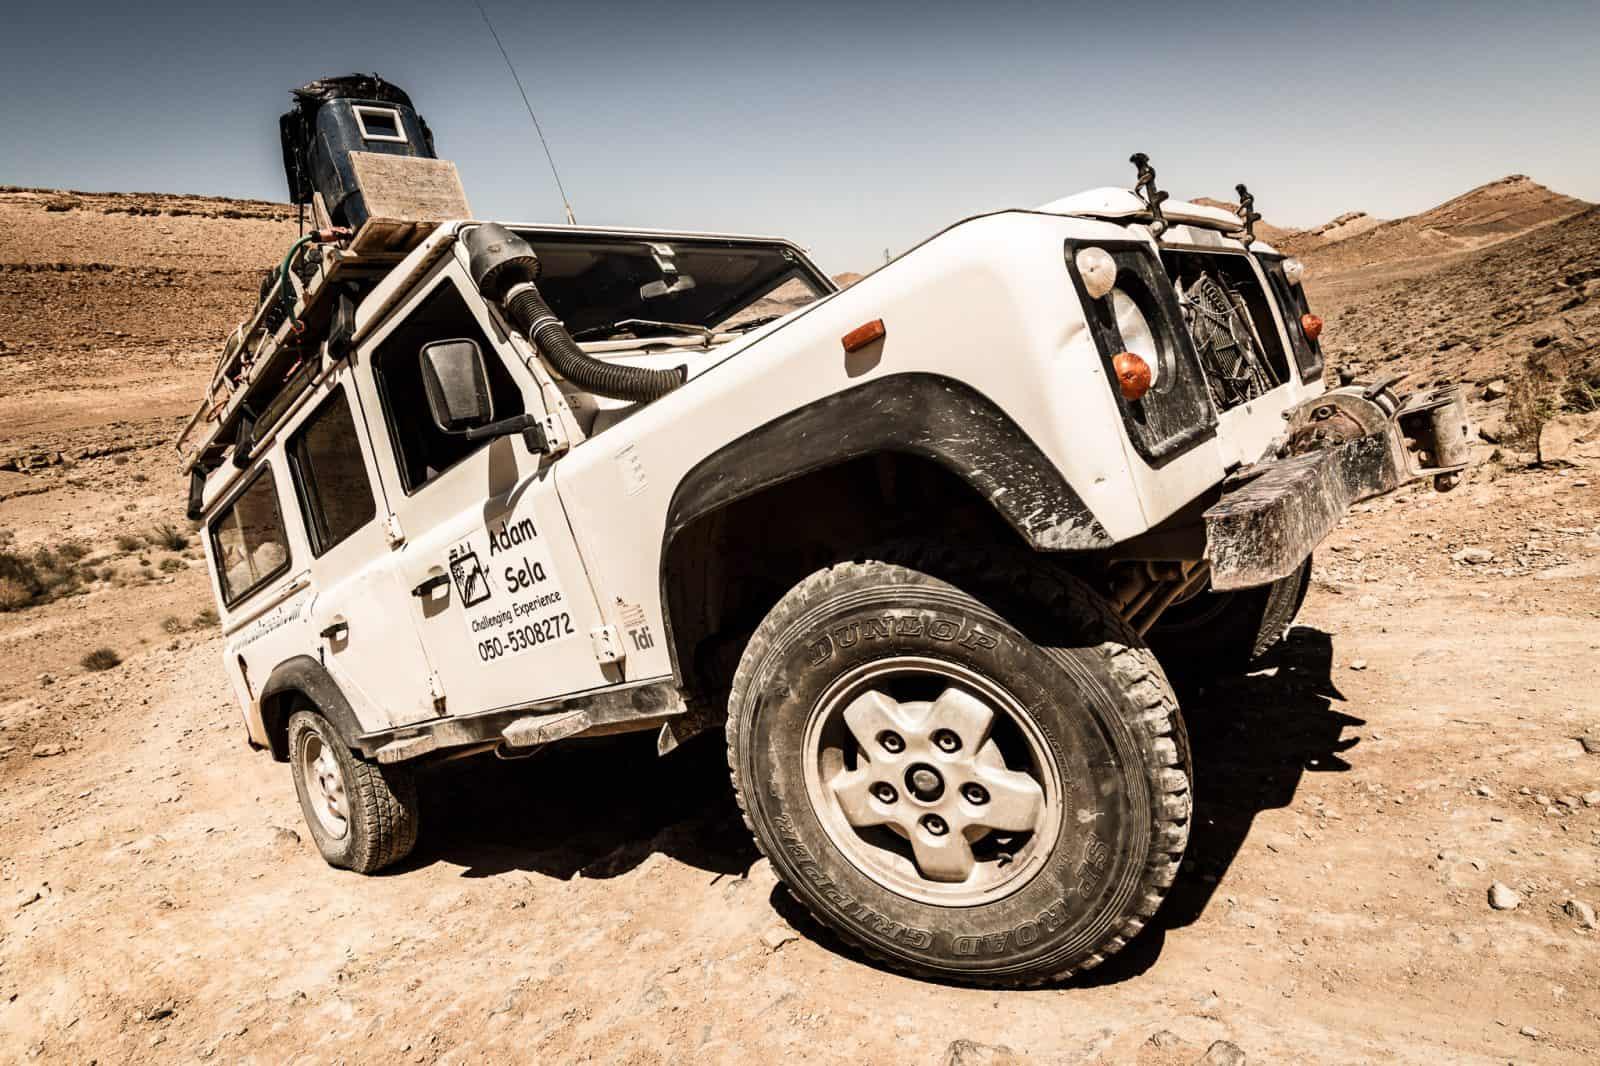 Exploring the Negev Desert with Adam Sela